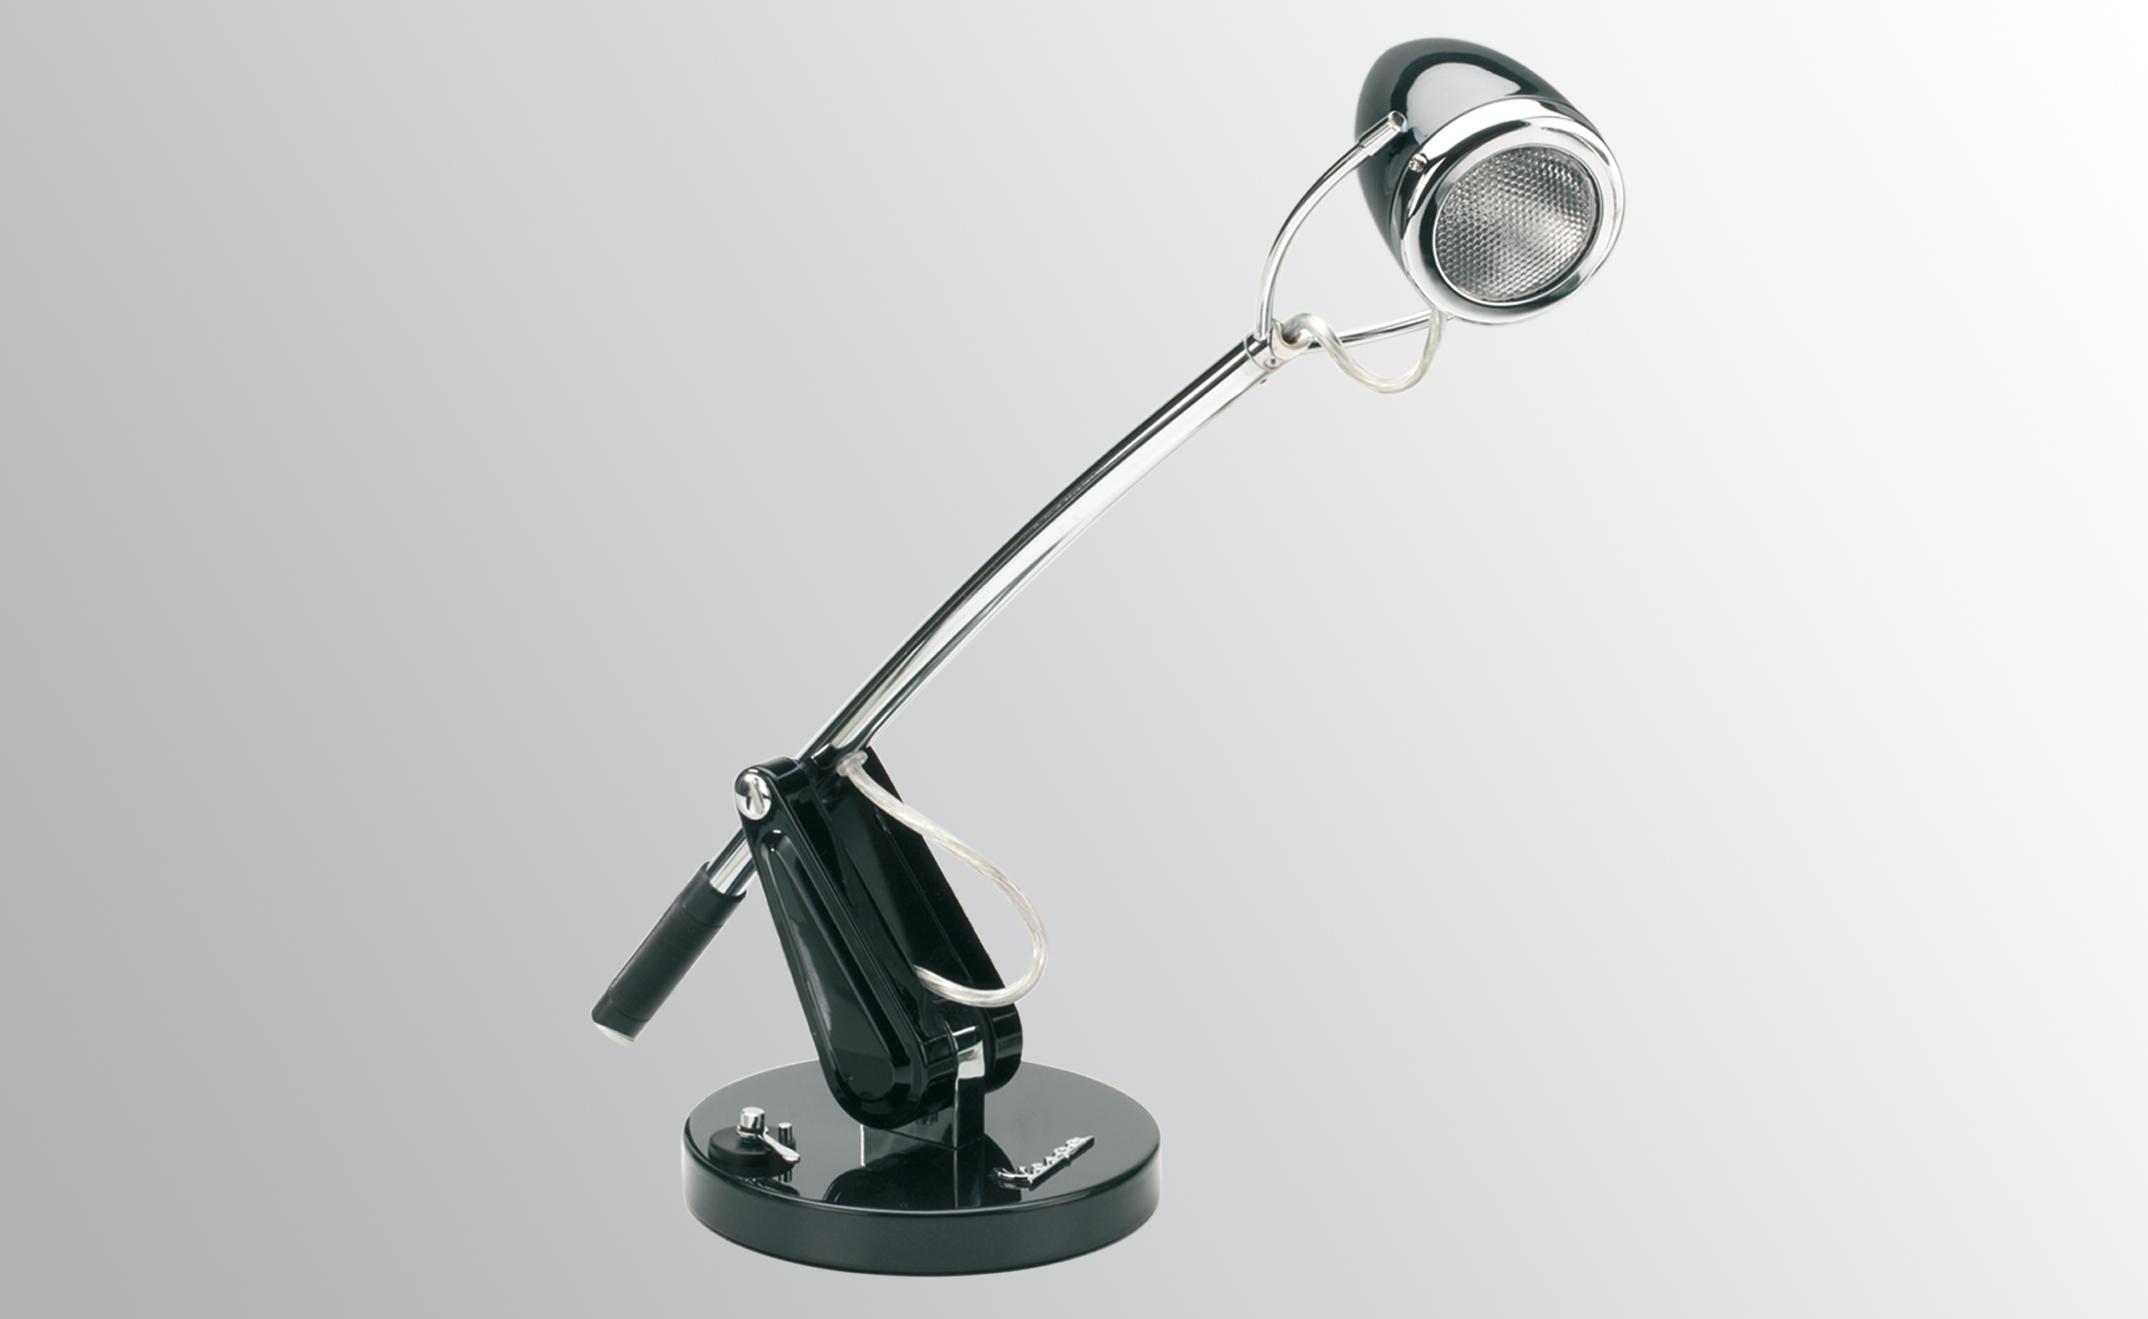 lampe de bureau r tro avec un phare de vespa. Black Bedroom Furniture Sets. Home Design Ideas